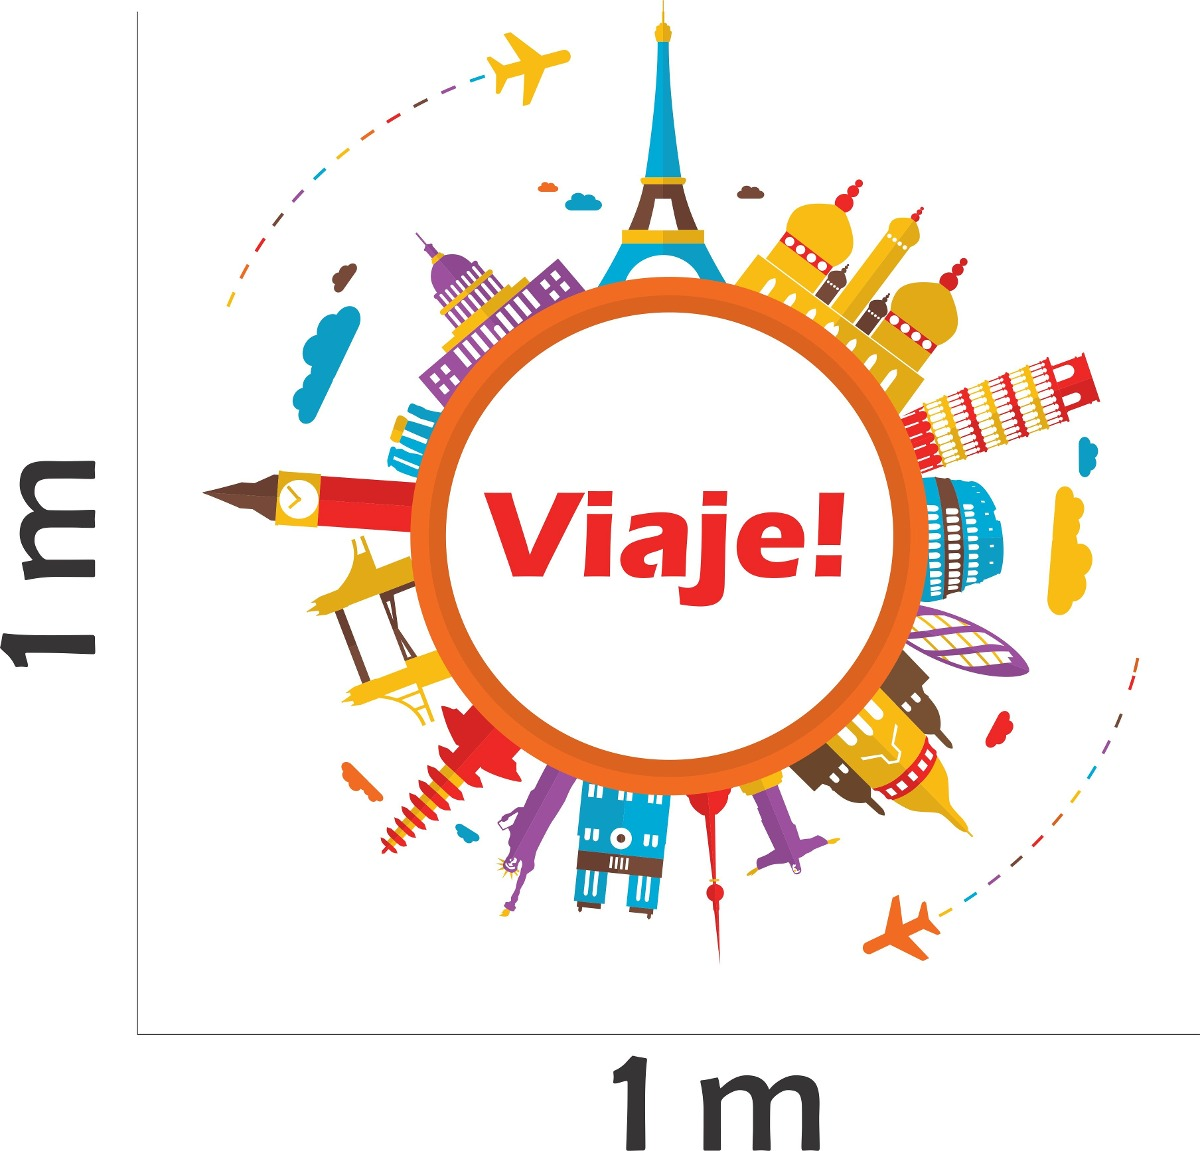 Armario Que Vira Mesa Tok Stok ~ Adesivo Parede Viagem Travel Torre Eiffel Big Ben Londres